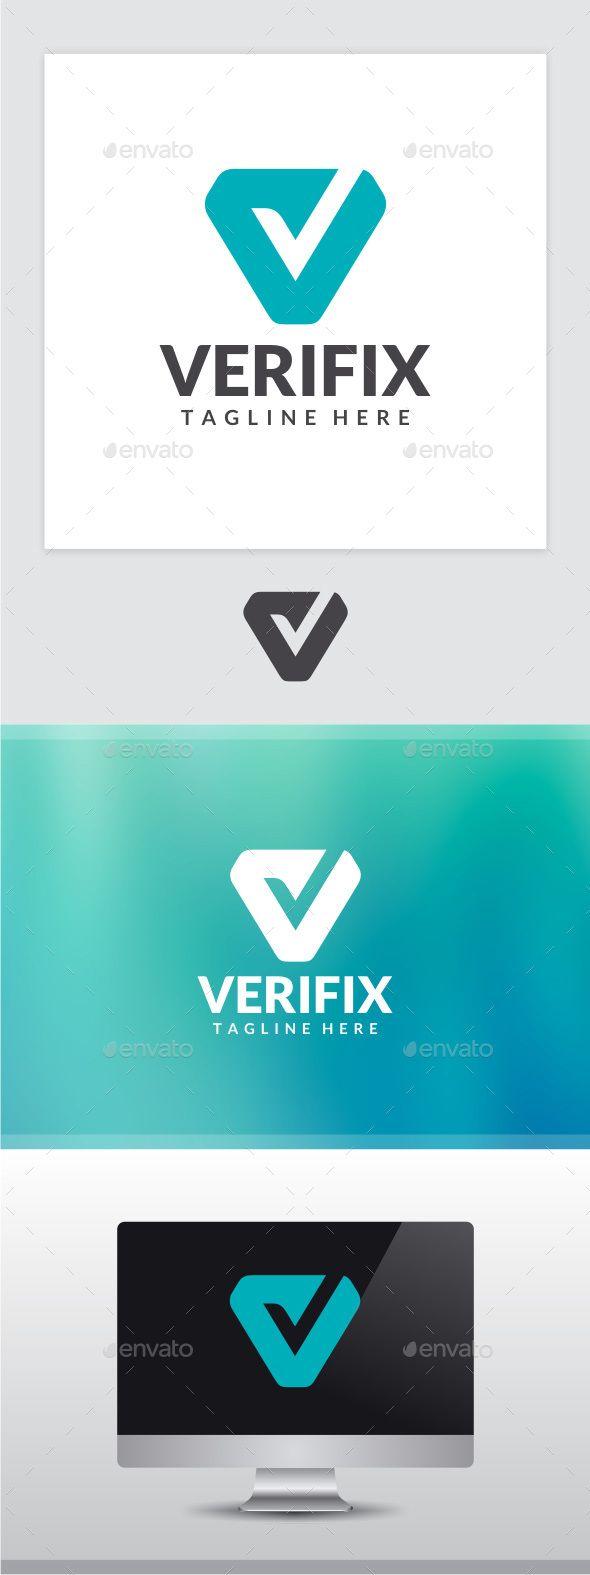 Verifix Letter V Logo — Photoshop PSD #app #V letter • Available here → https://graphicriver.net/item/verifix-letter-v-logo/13919409?ref=pxcr